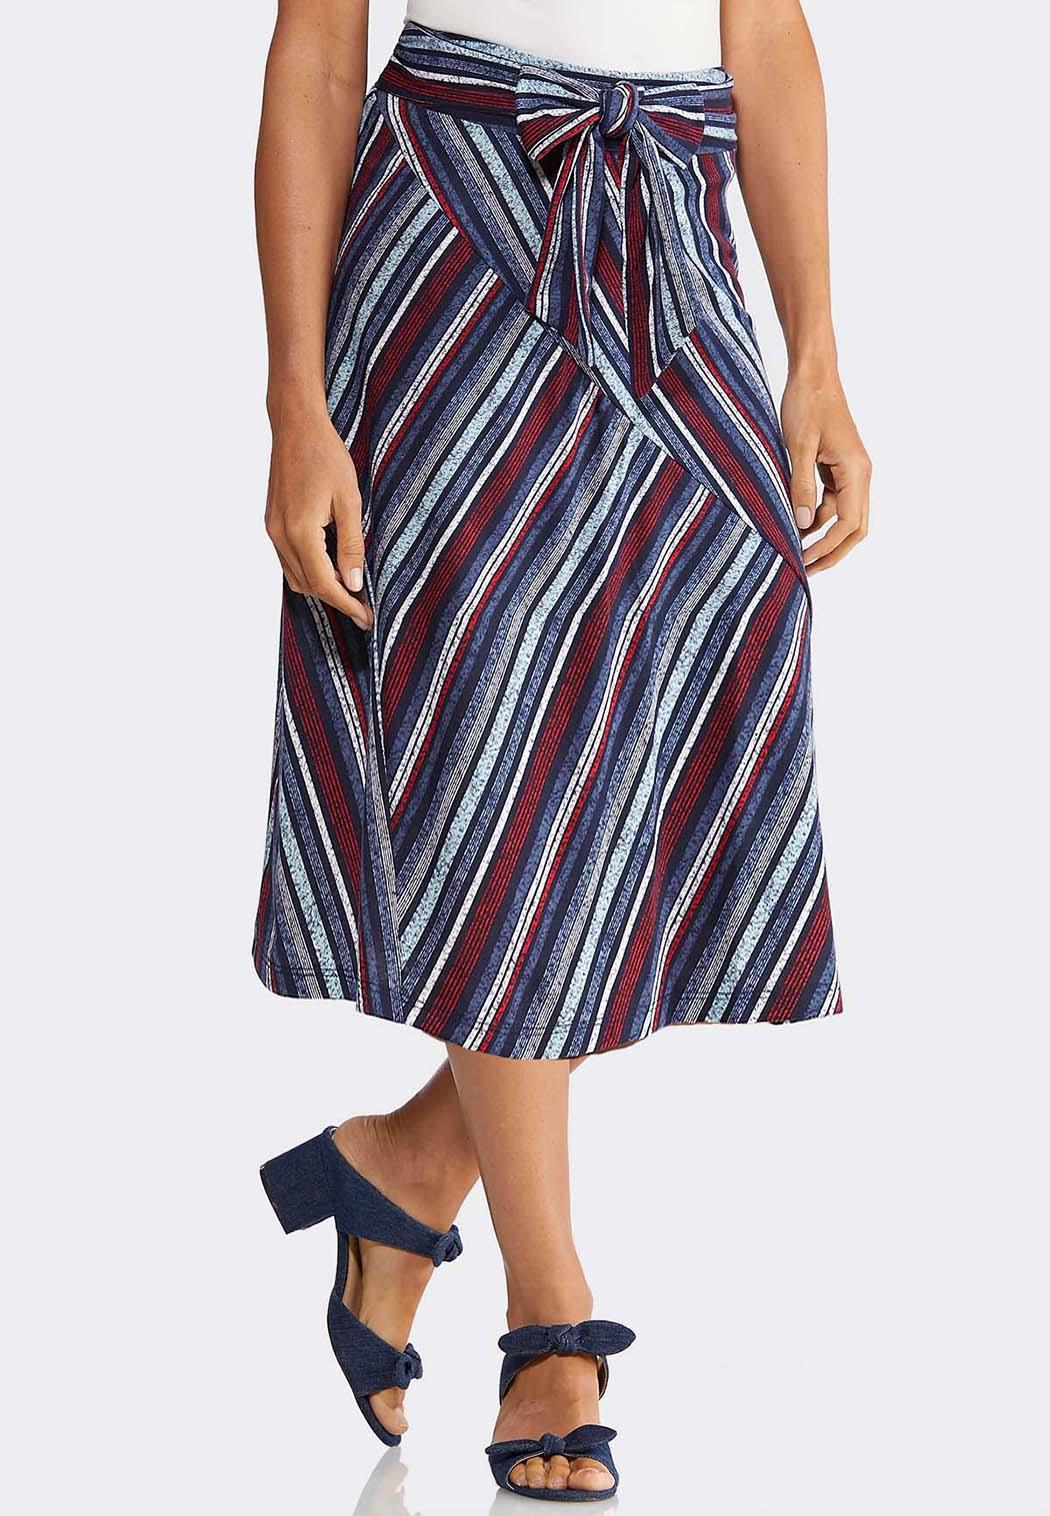 527be0ed19 Women's Plus Size Skirts